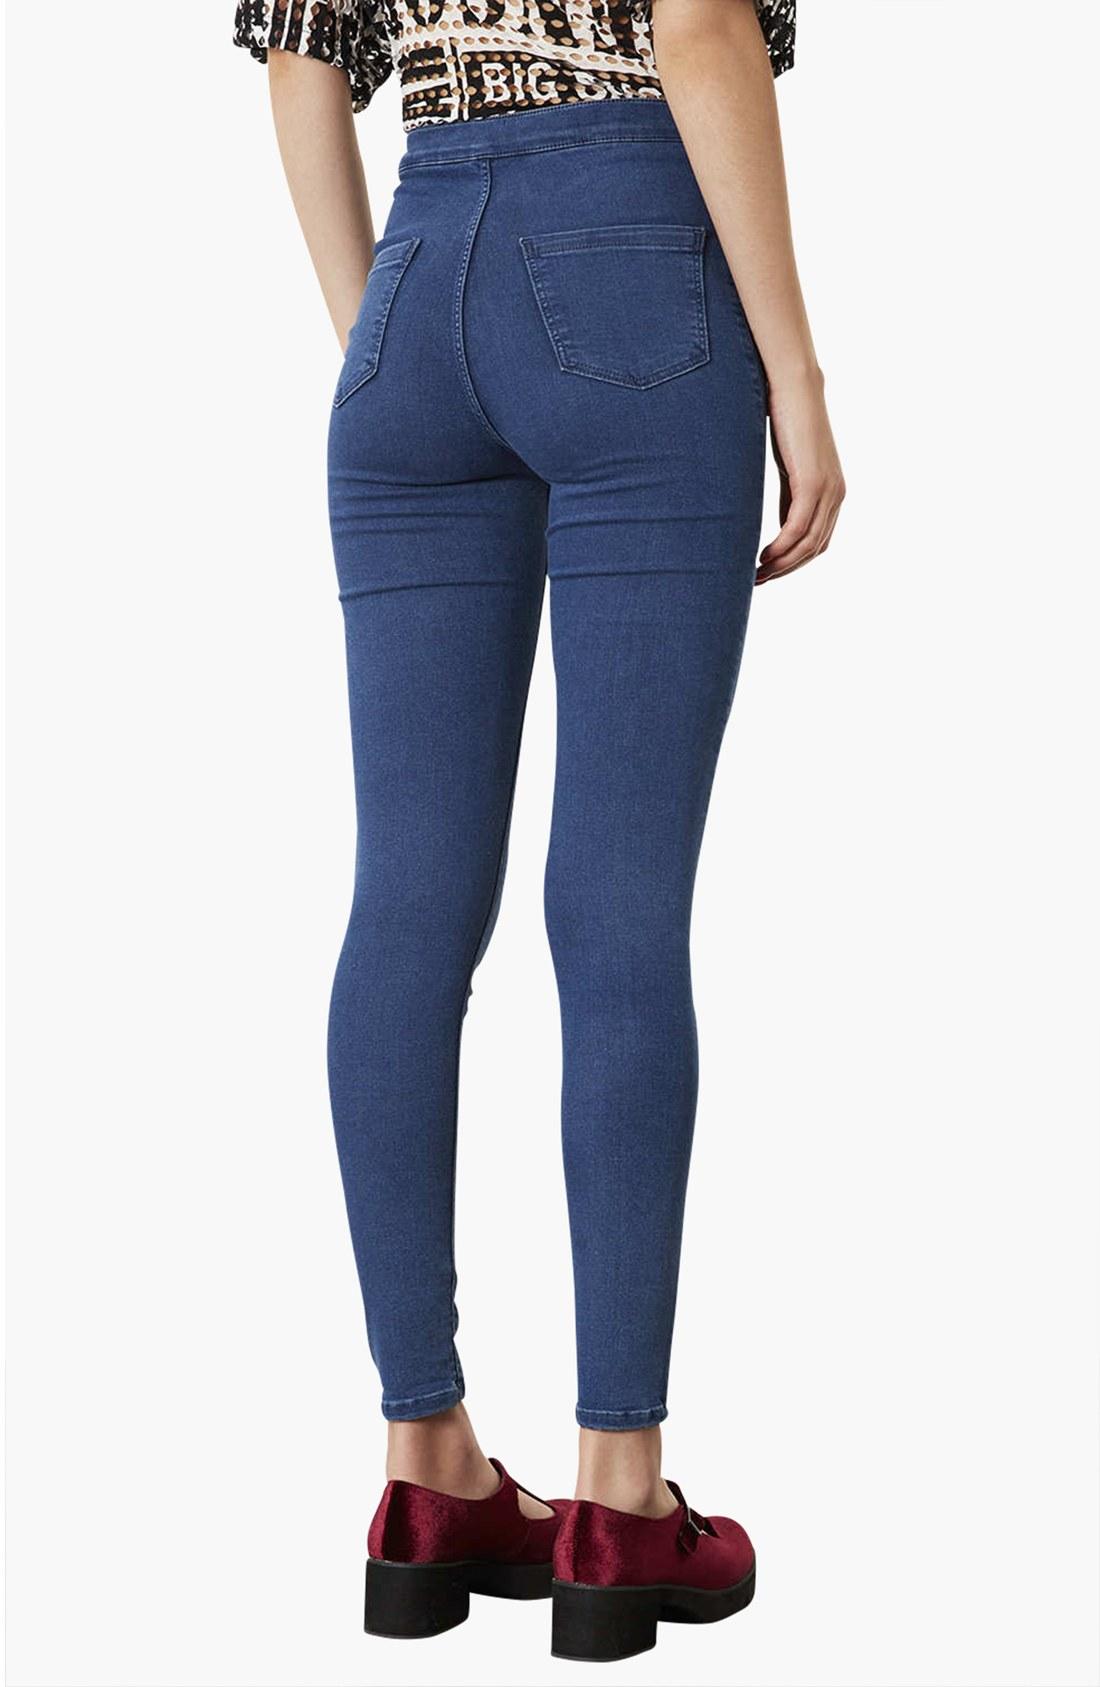 Topshop Moto Joni High Waist Skinny Jeans in Blue | Lyst